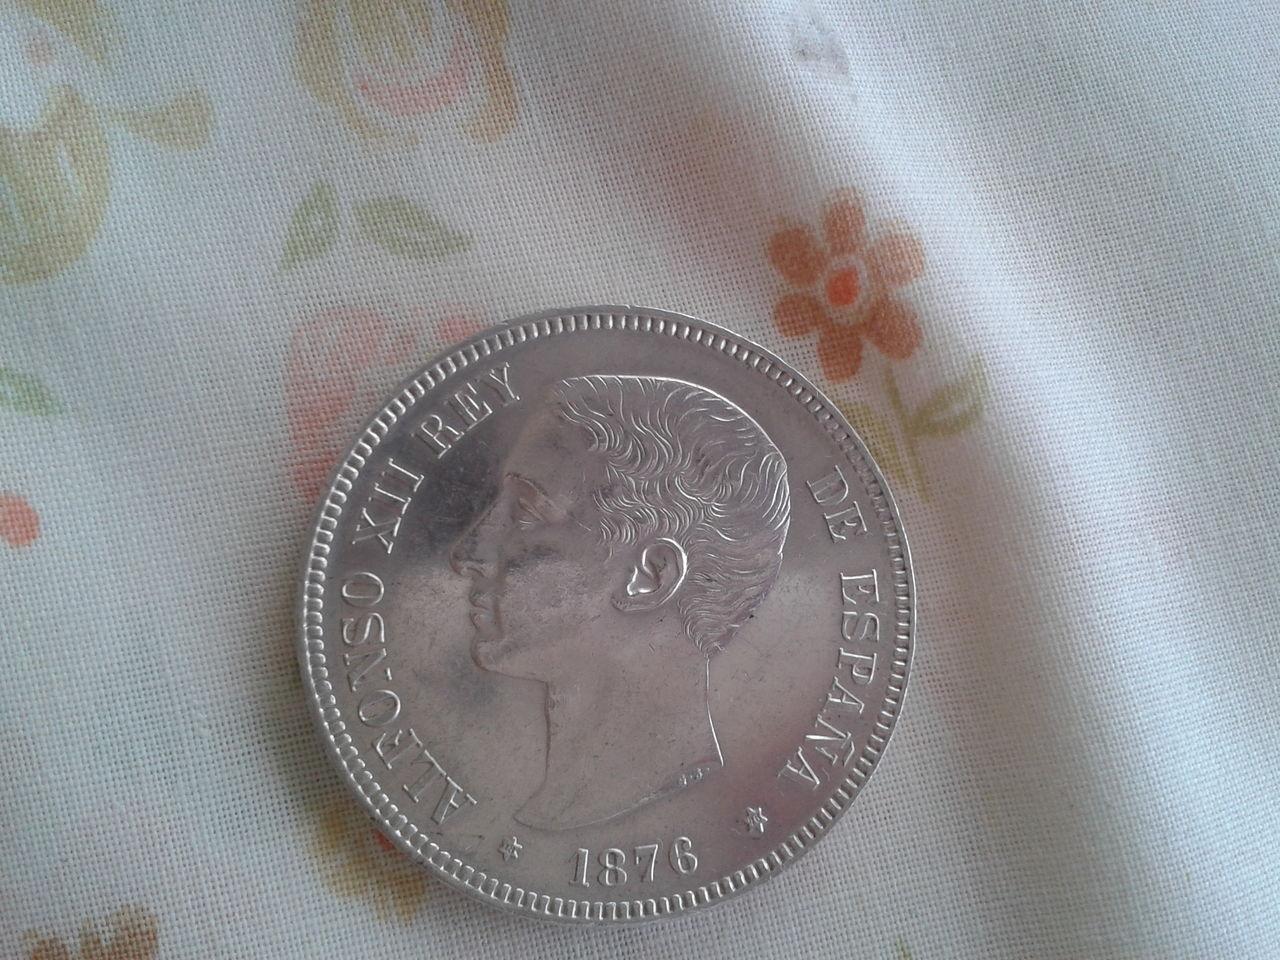 5 pesetas 1876 *18*76 - Alfonso XIII. 2014_10_04_12_59_01